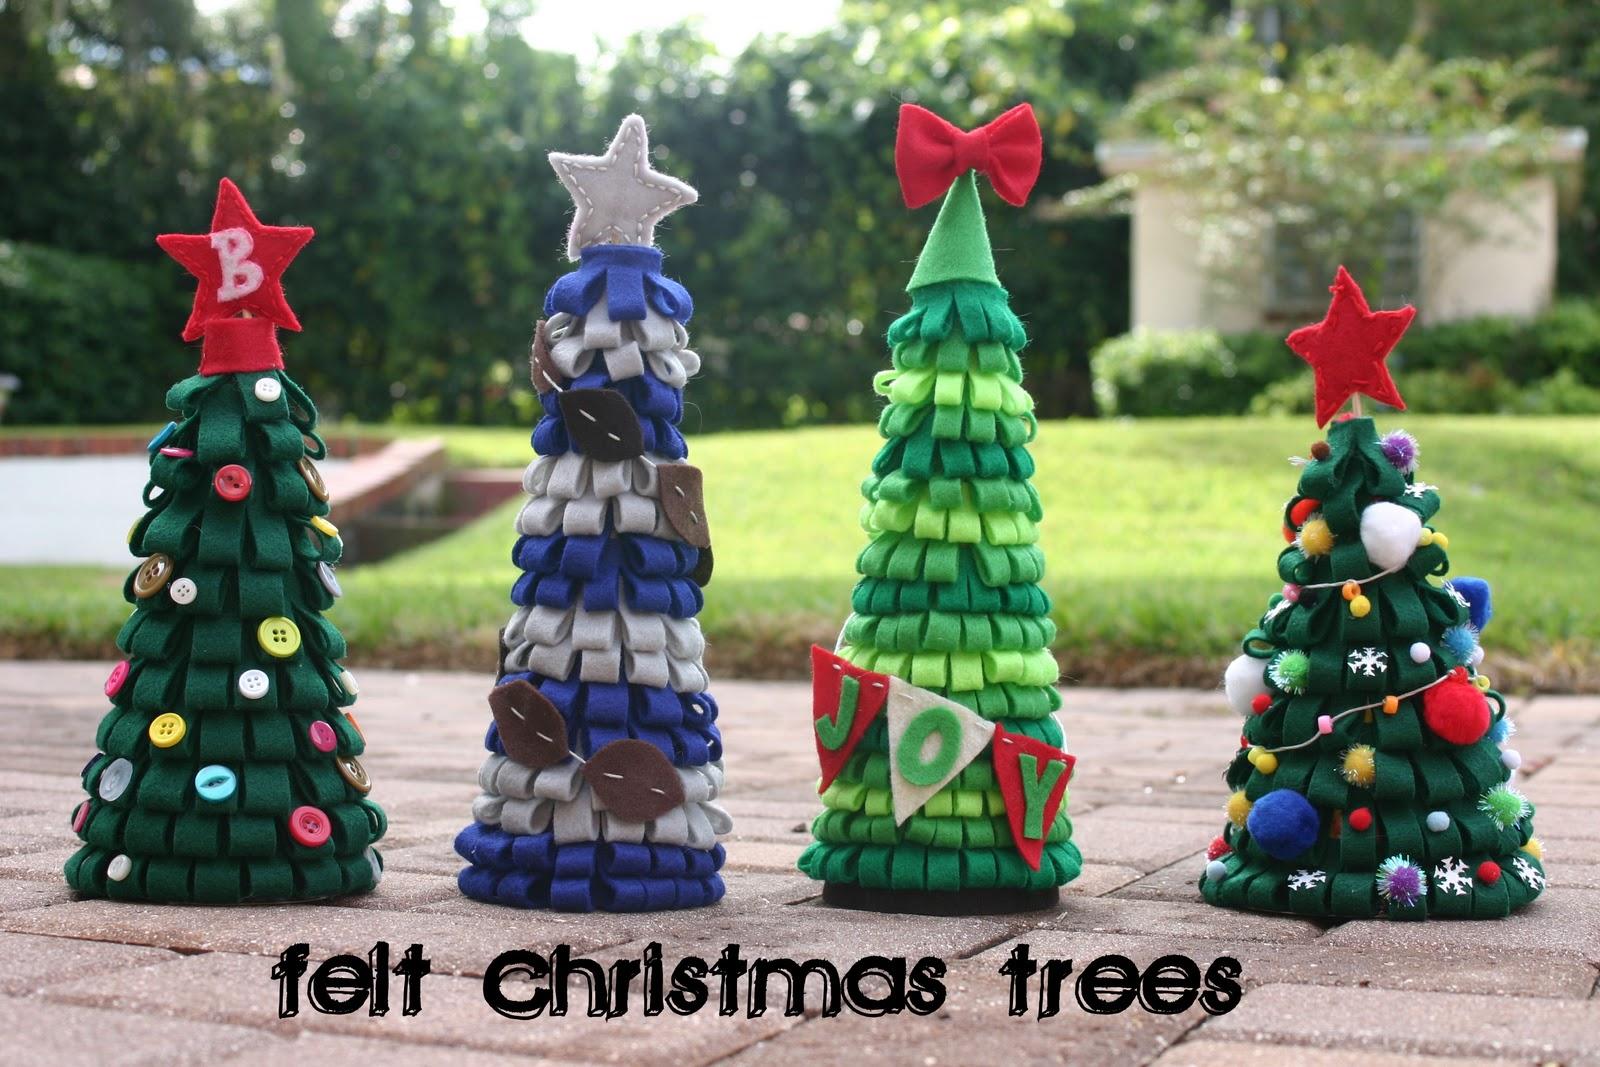 Felt Christmas Trees - Lines Across